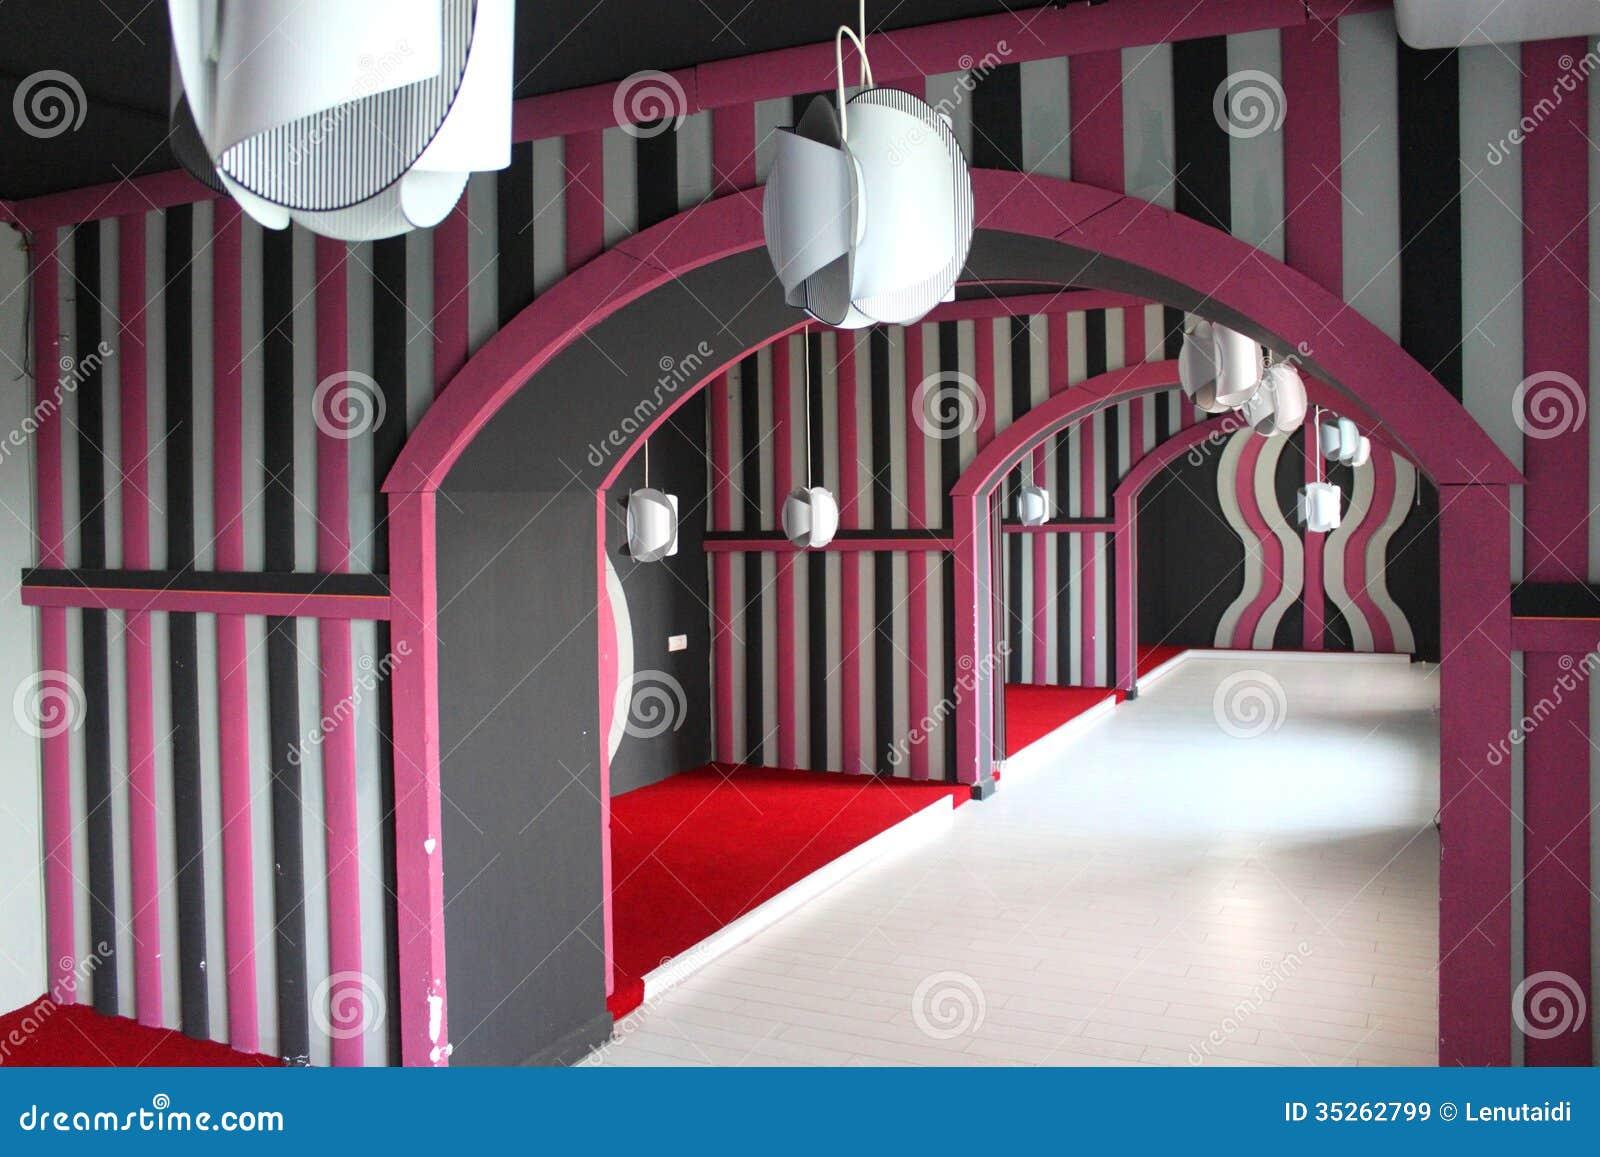 Pink salon renovation stock image image of architectural for Salon renovation